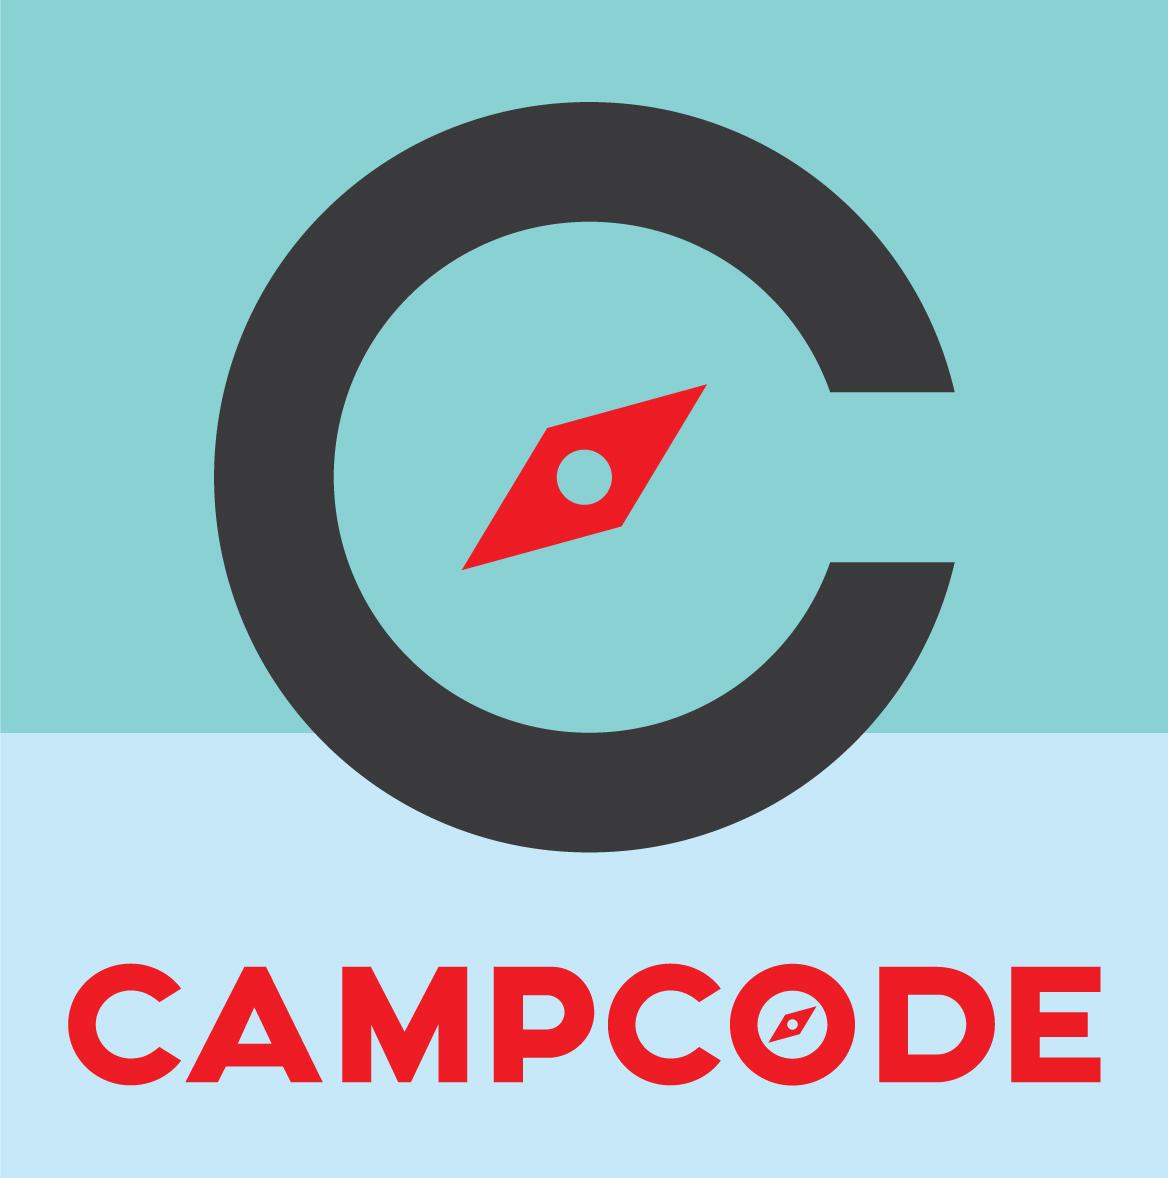 CC_Logo_MasterClass.jpg